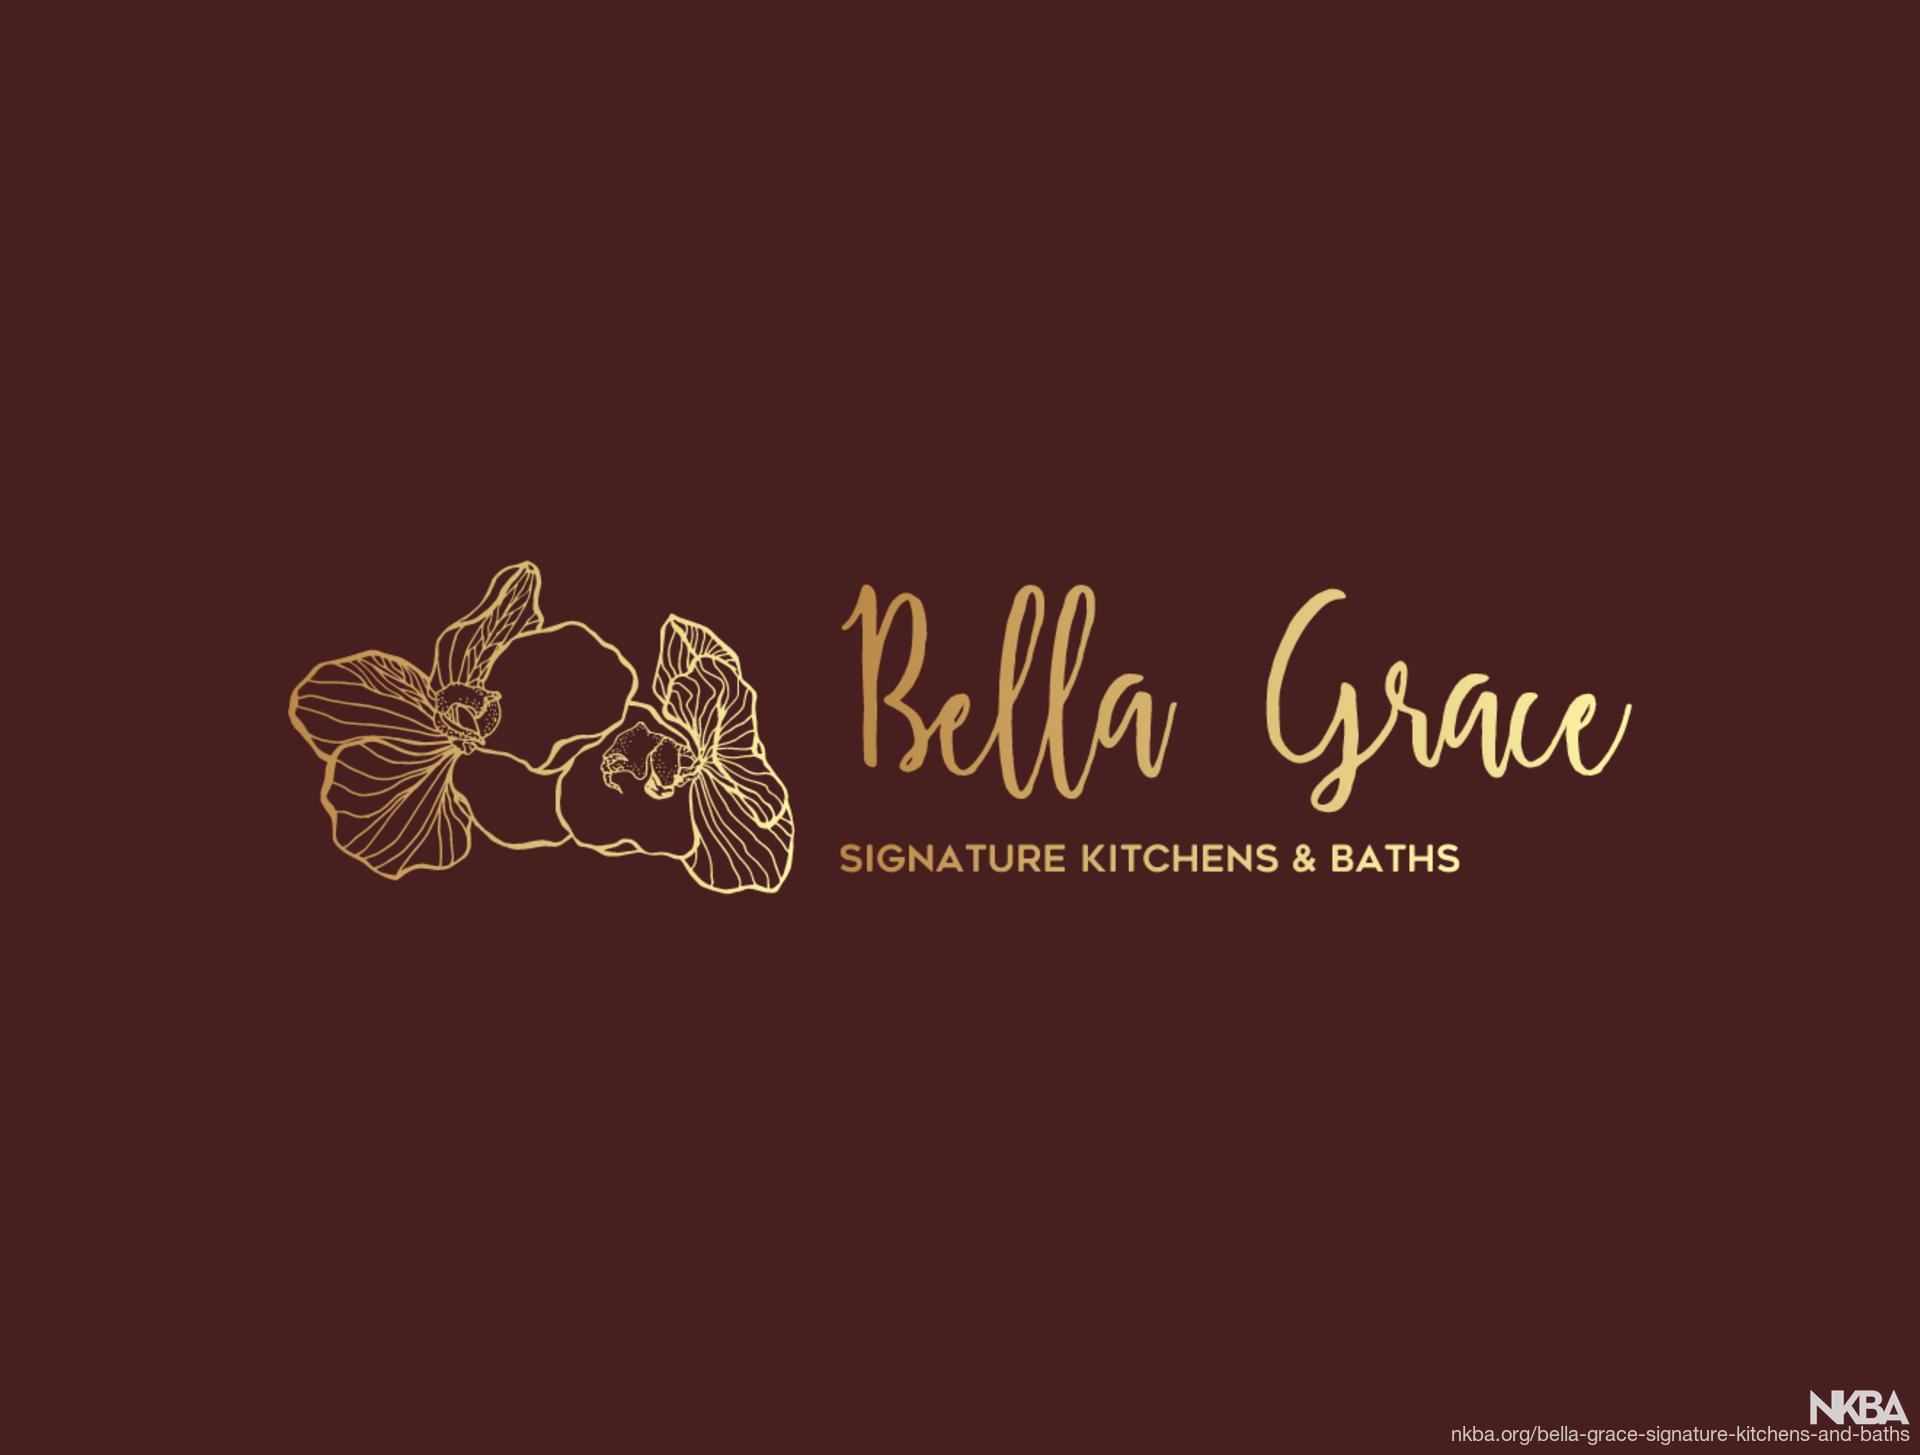 Bella Grace Signature Kitchens & Baths - NKBA